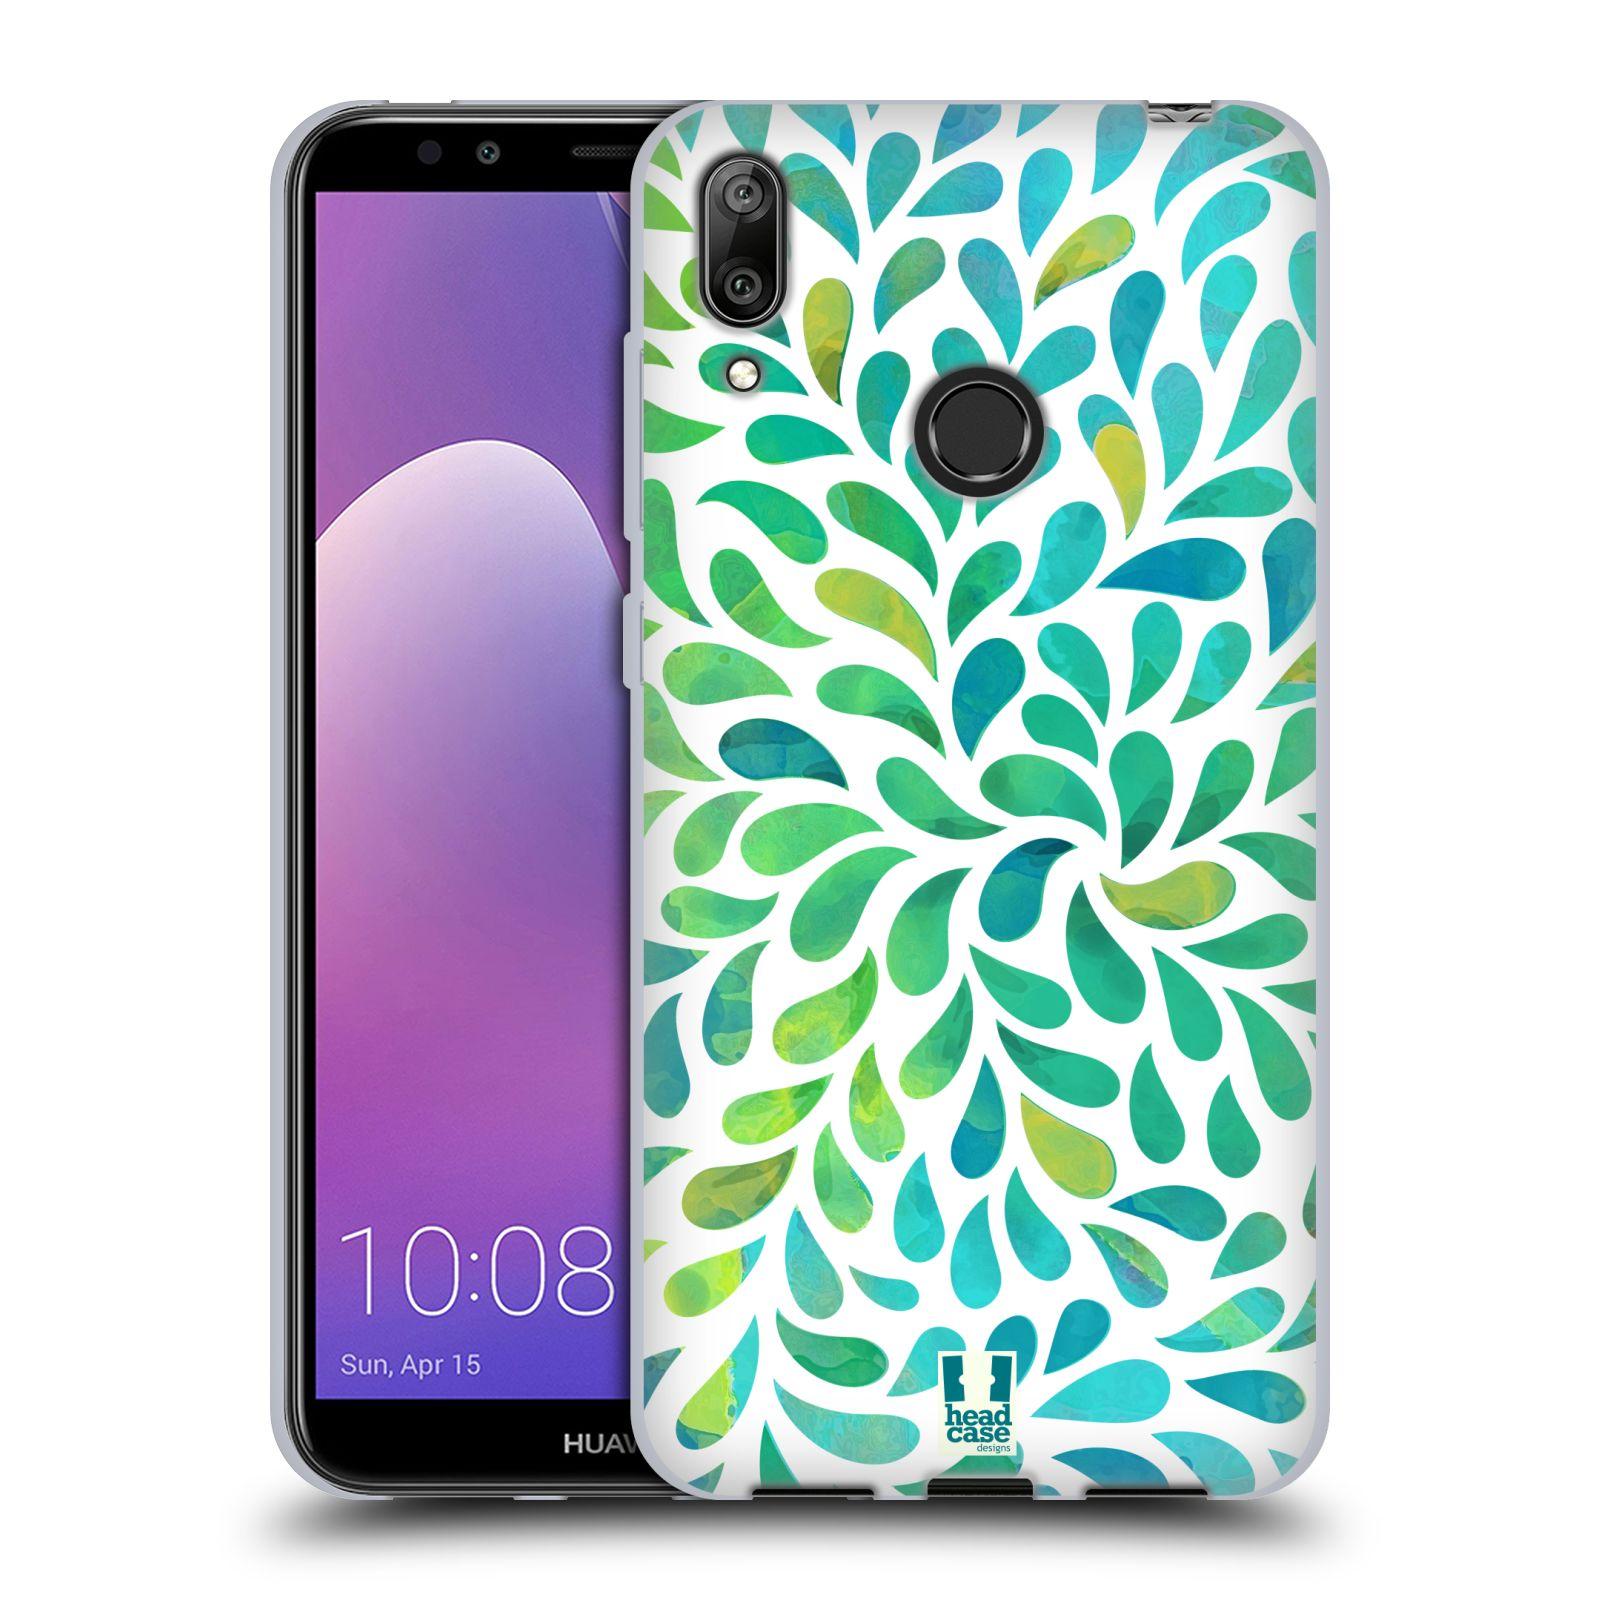 Silikonové pouzdro na mobil Huawei Y7 (2019) - Head Case - Droplet Wave Kapičky